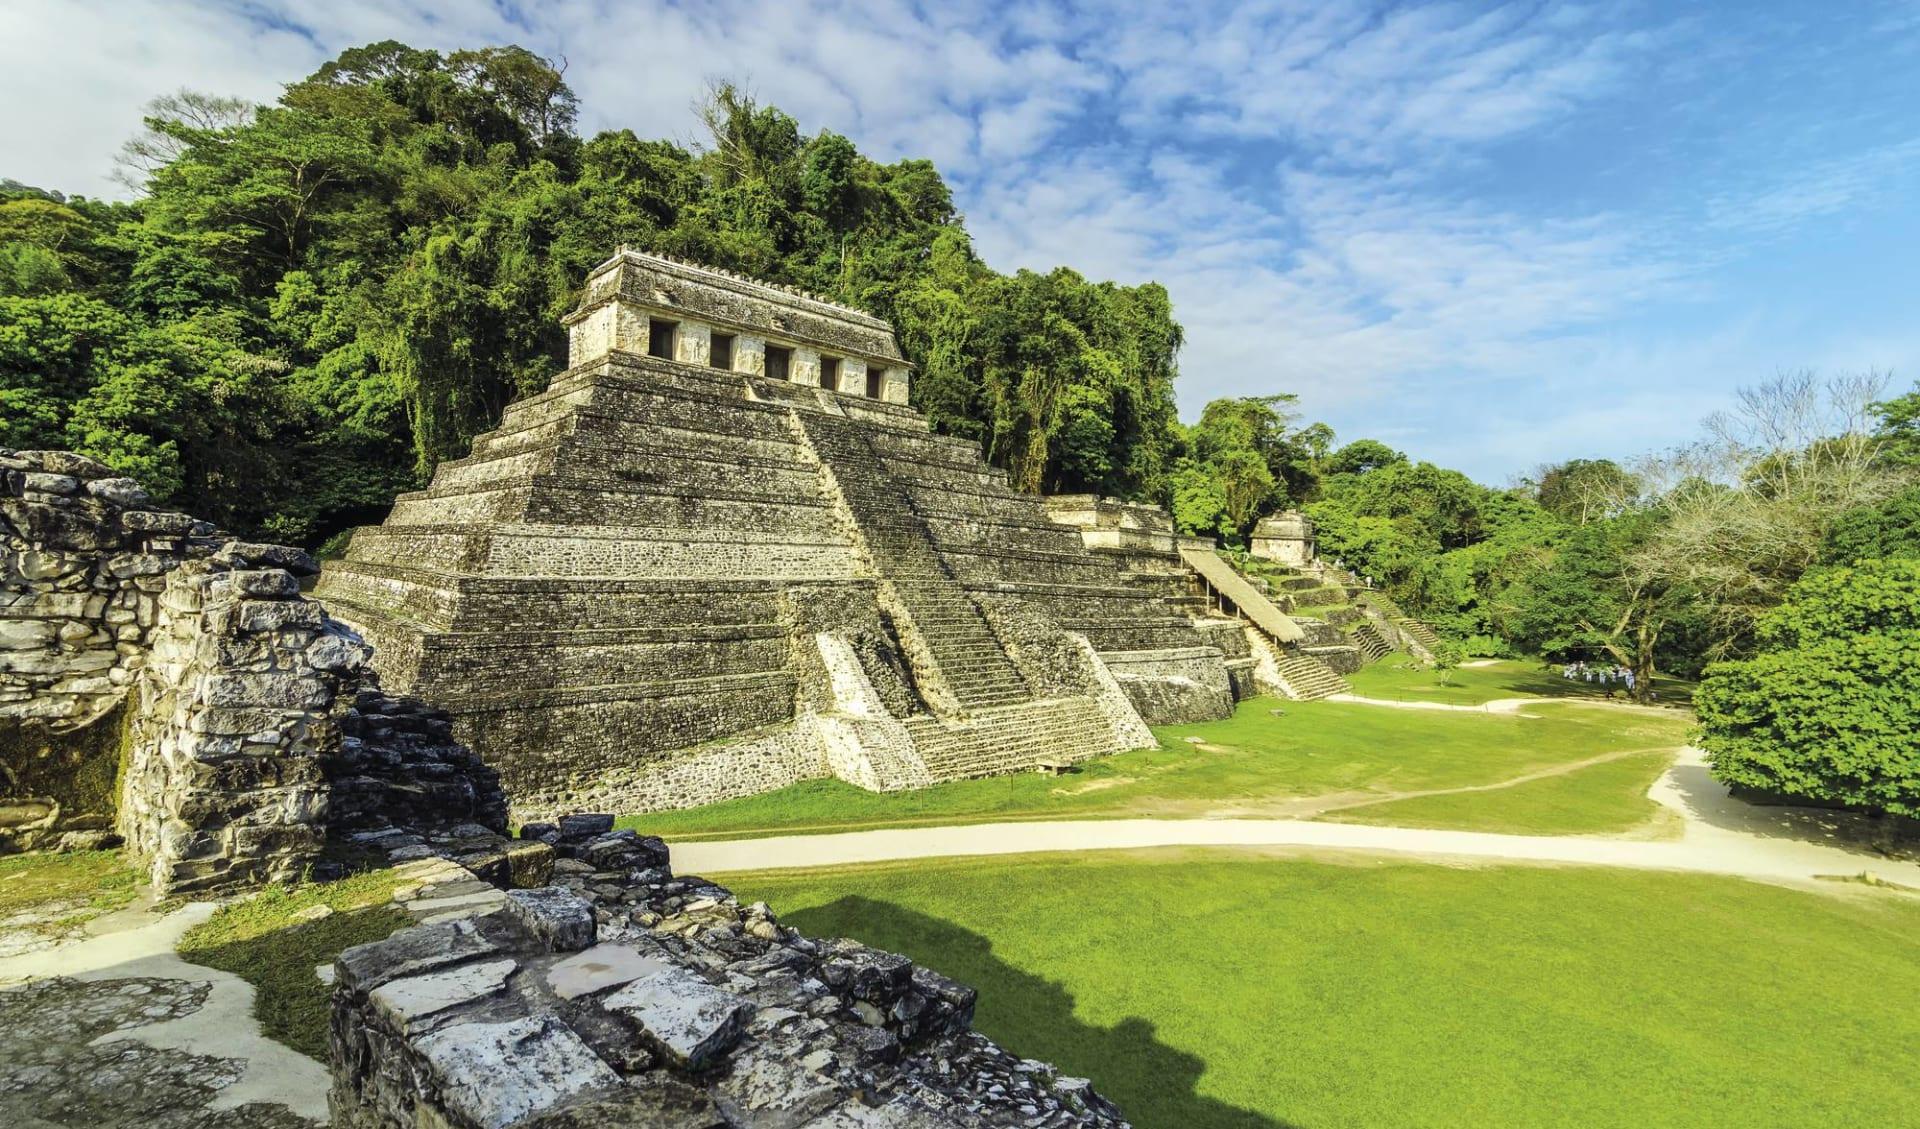 Yucatán und Chiapas ab Cancun: Mexiko - Palenque - Maya Tempel